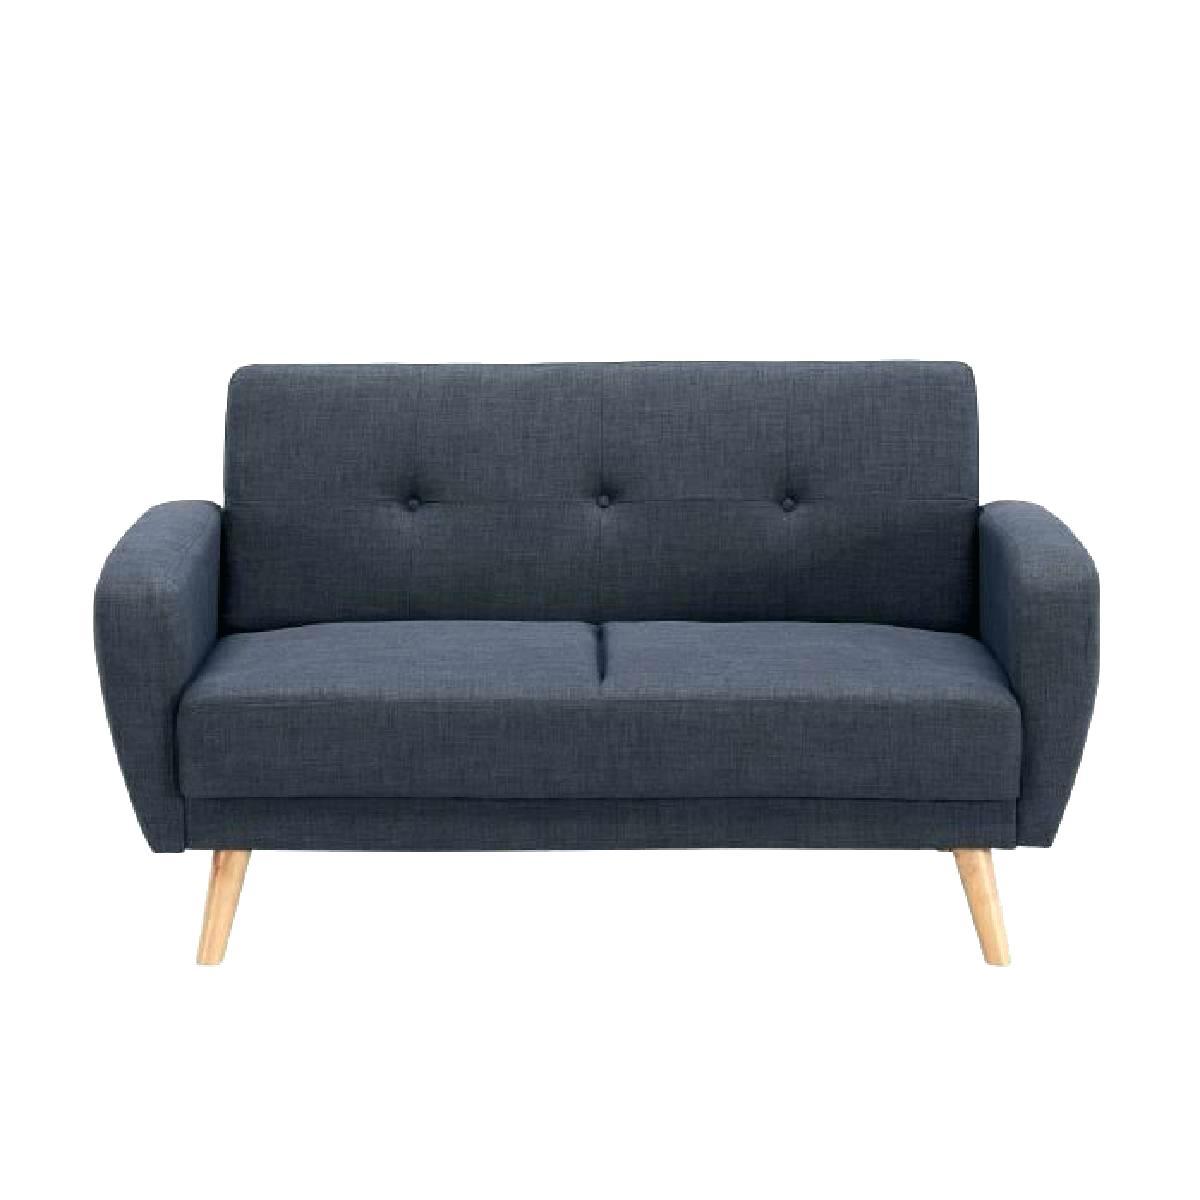 Canapé Modulable Ikea Impressionnant Images Lit Noir Ikea 22 2 Places Elegant Articles with Canape Convertible